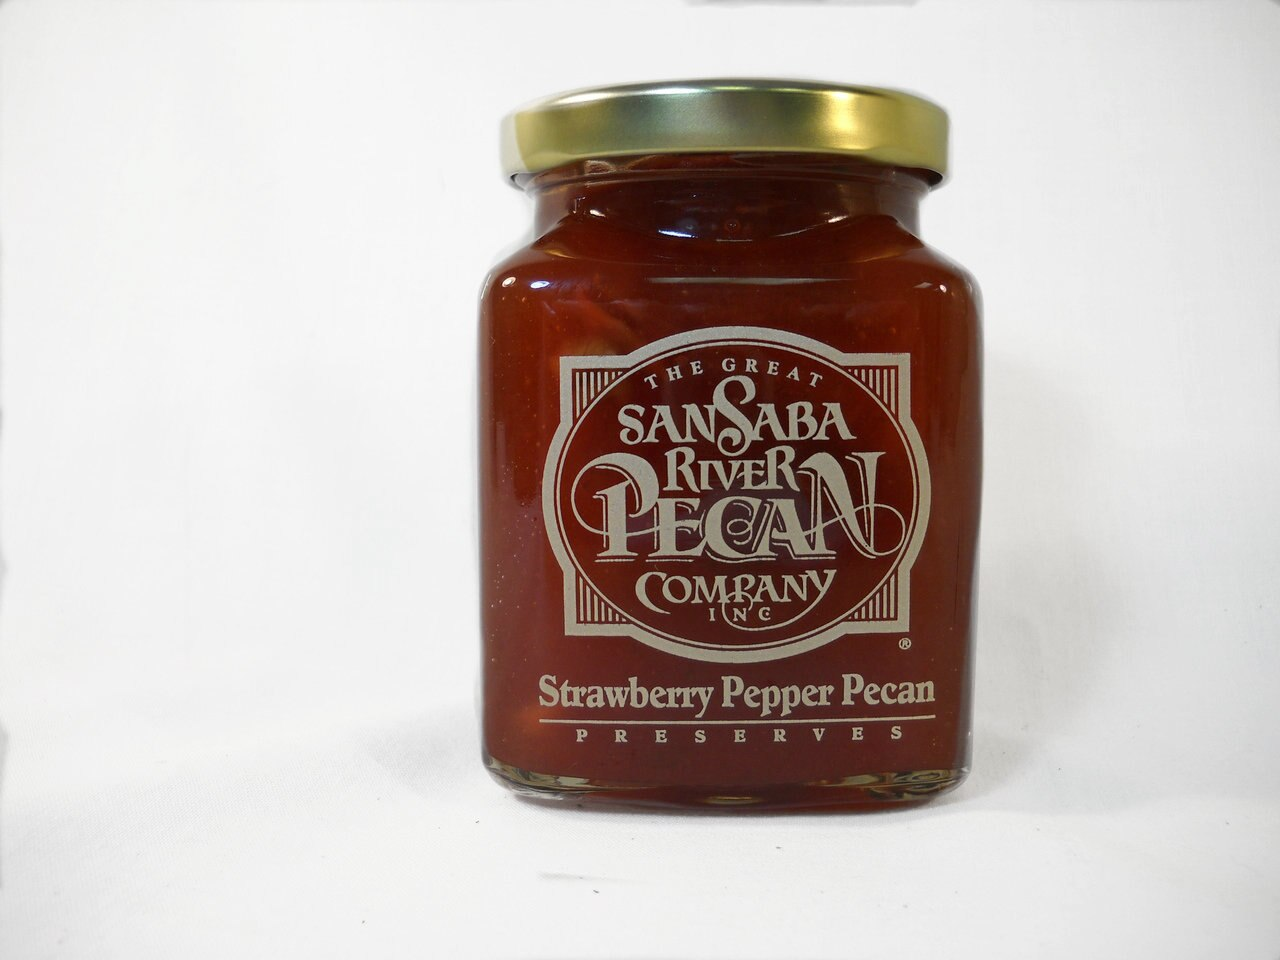 Strawberry Pepper Pecan Preserves 1